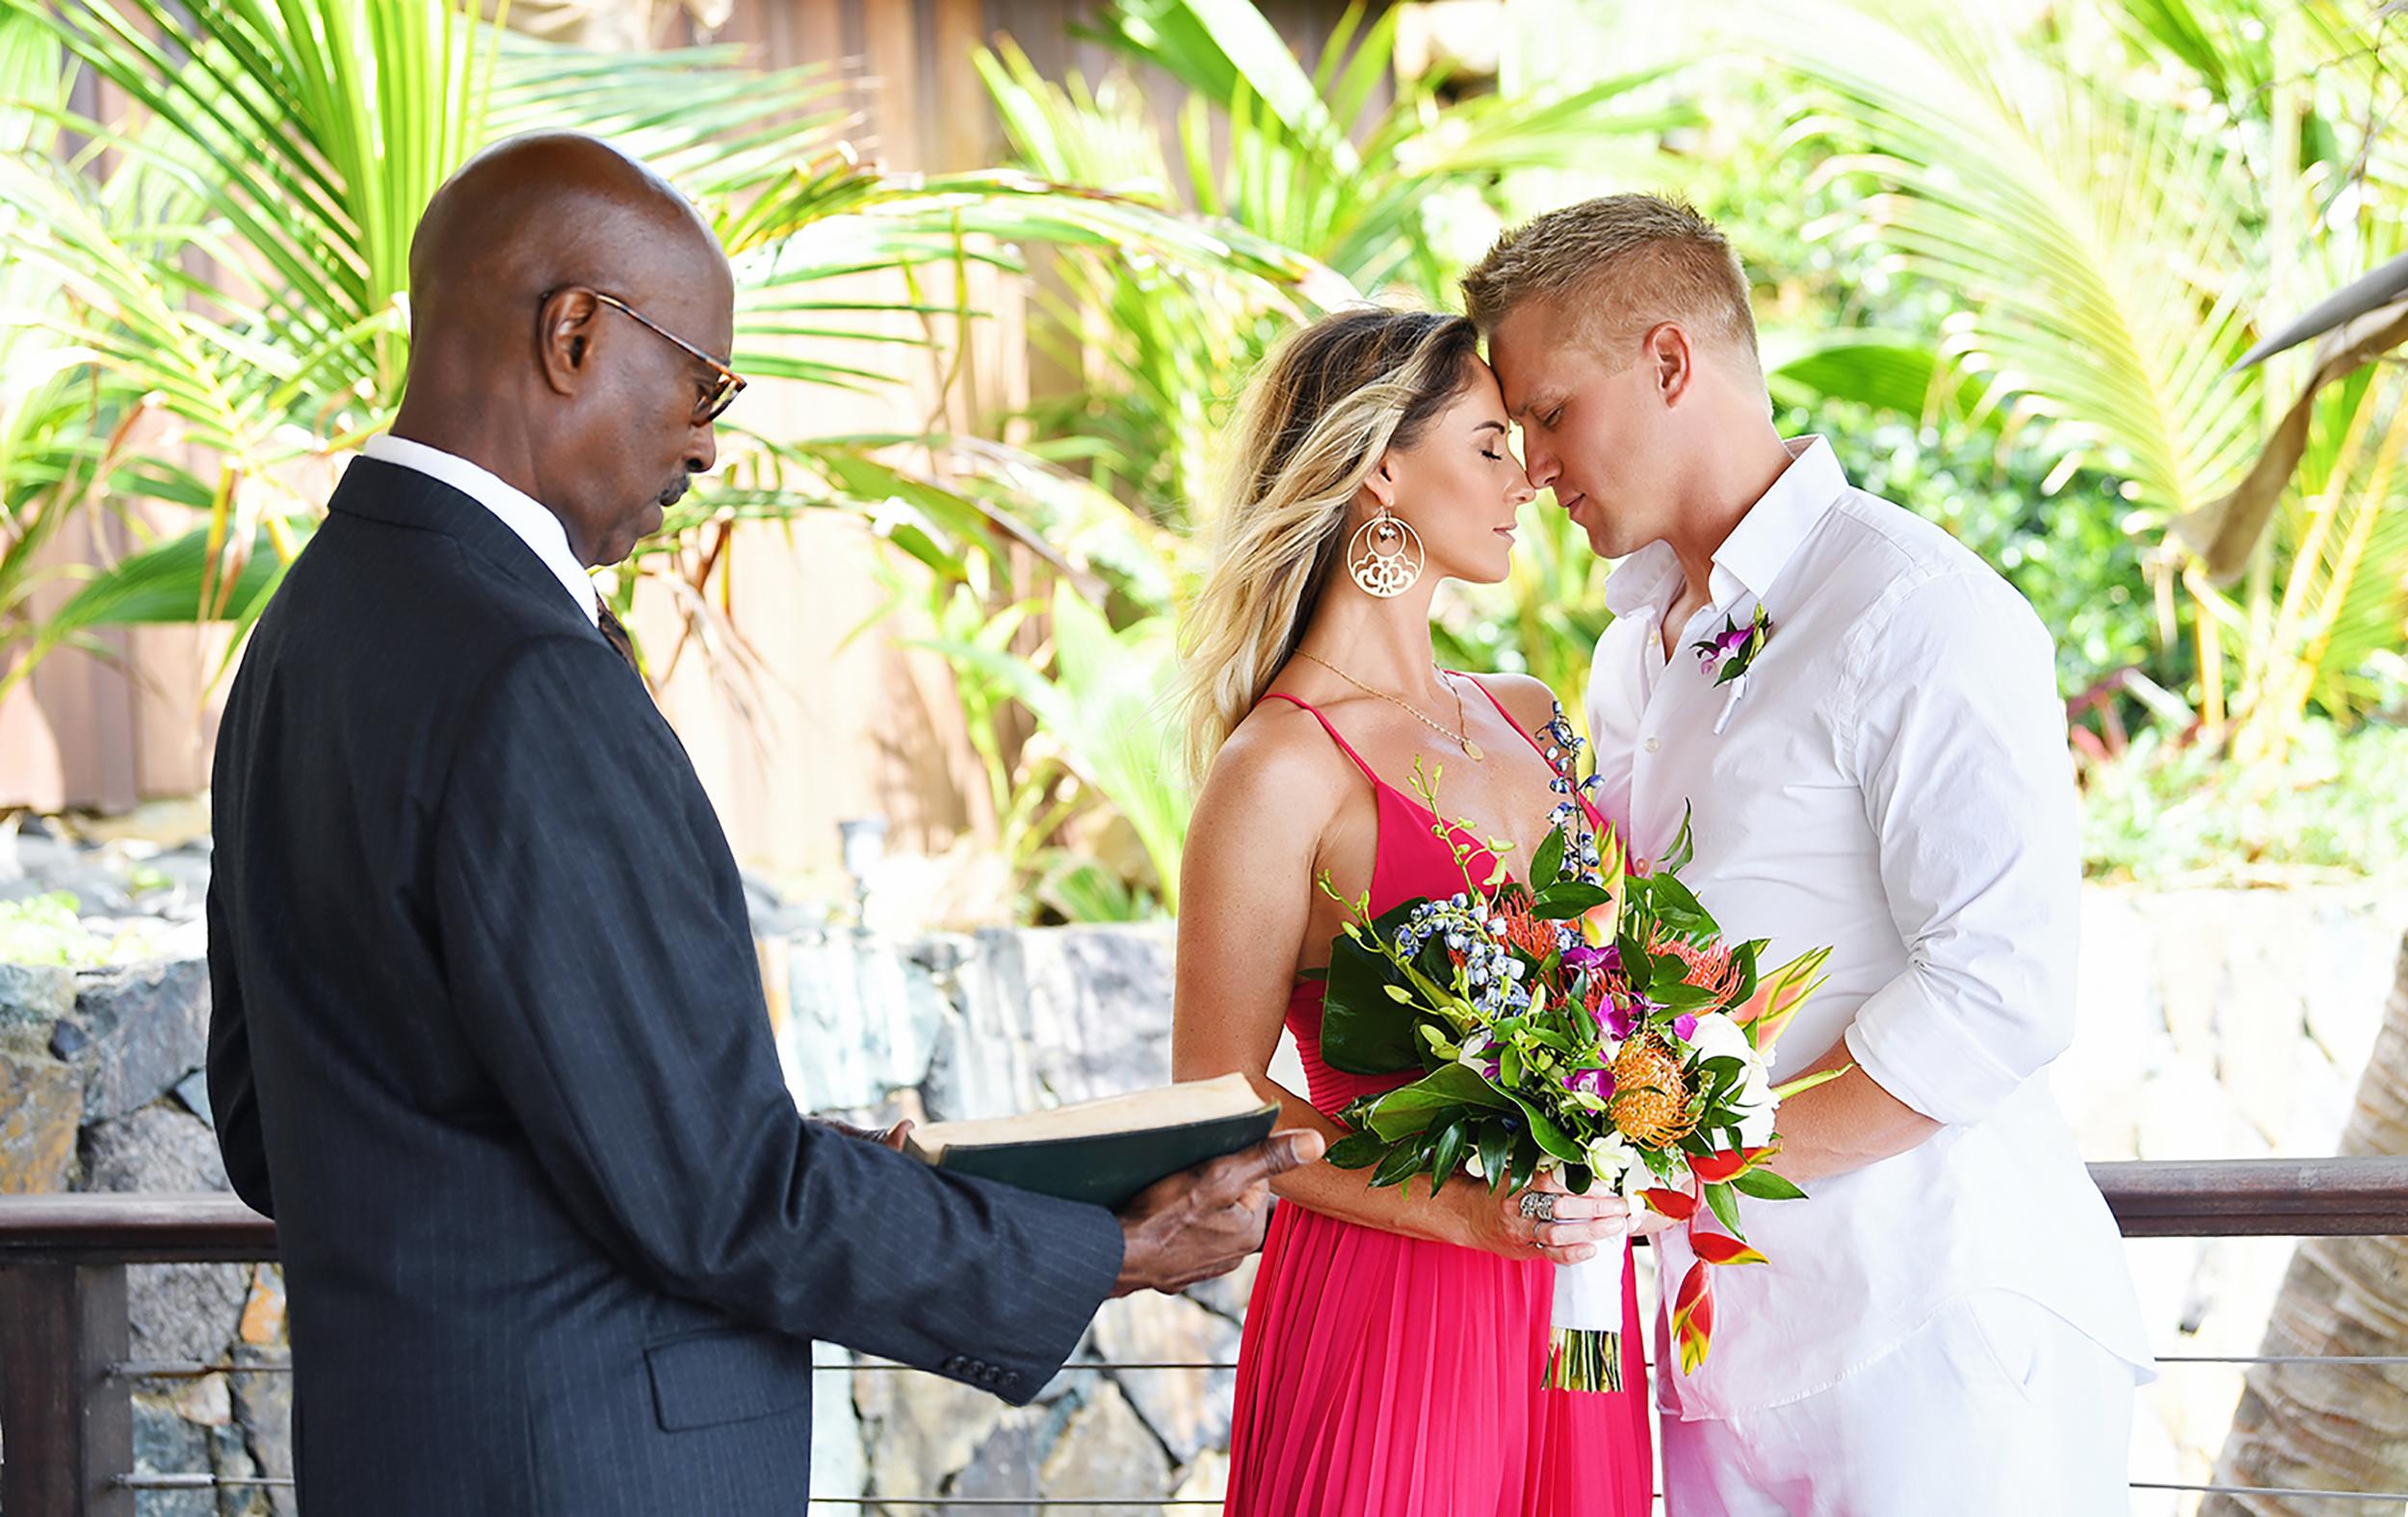 Wedding Bliss Celebrations - Private & romantic destination weddings